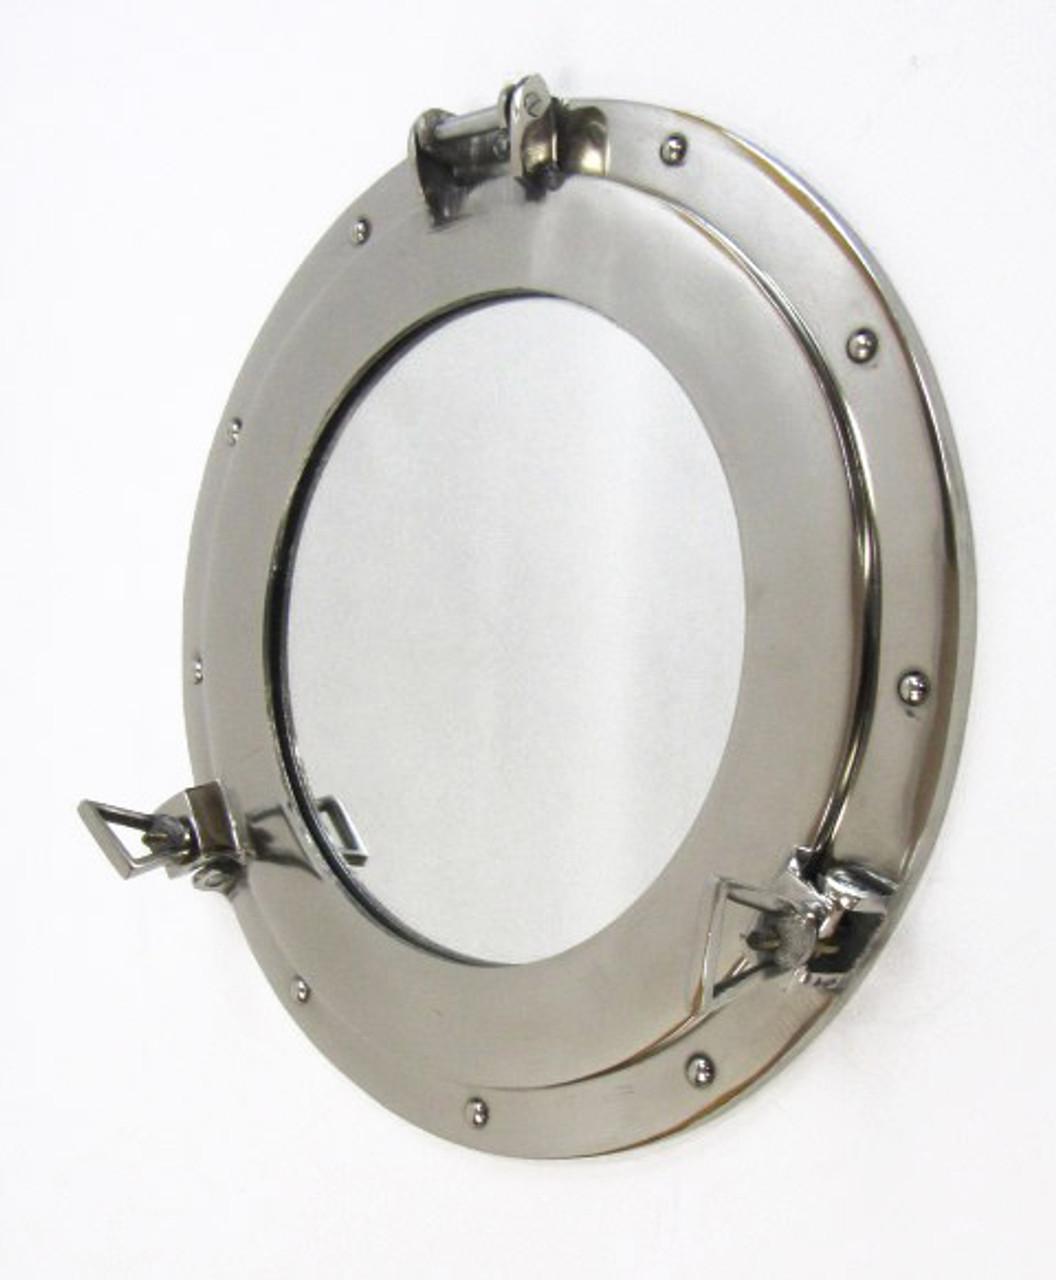 Aluminum Chrome Finish Ships Cabin Porthole Mirror